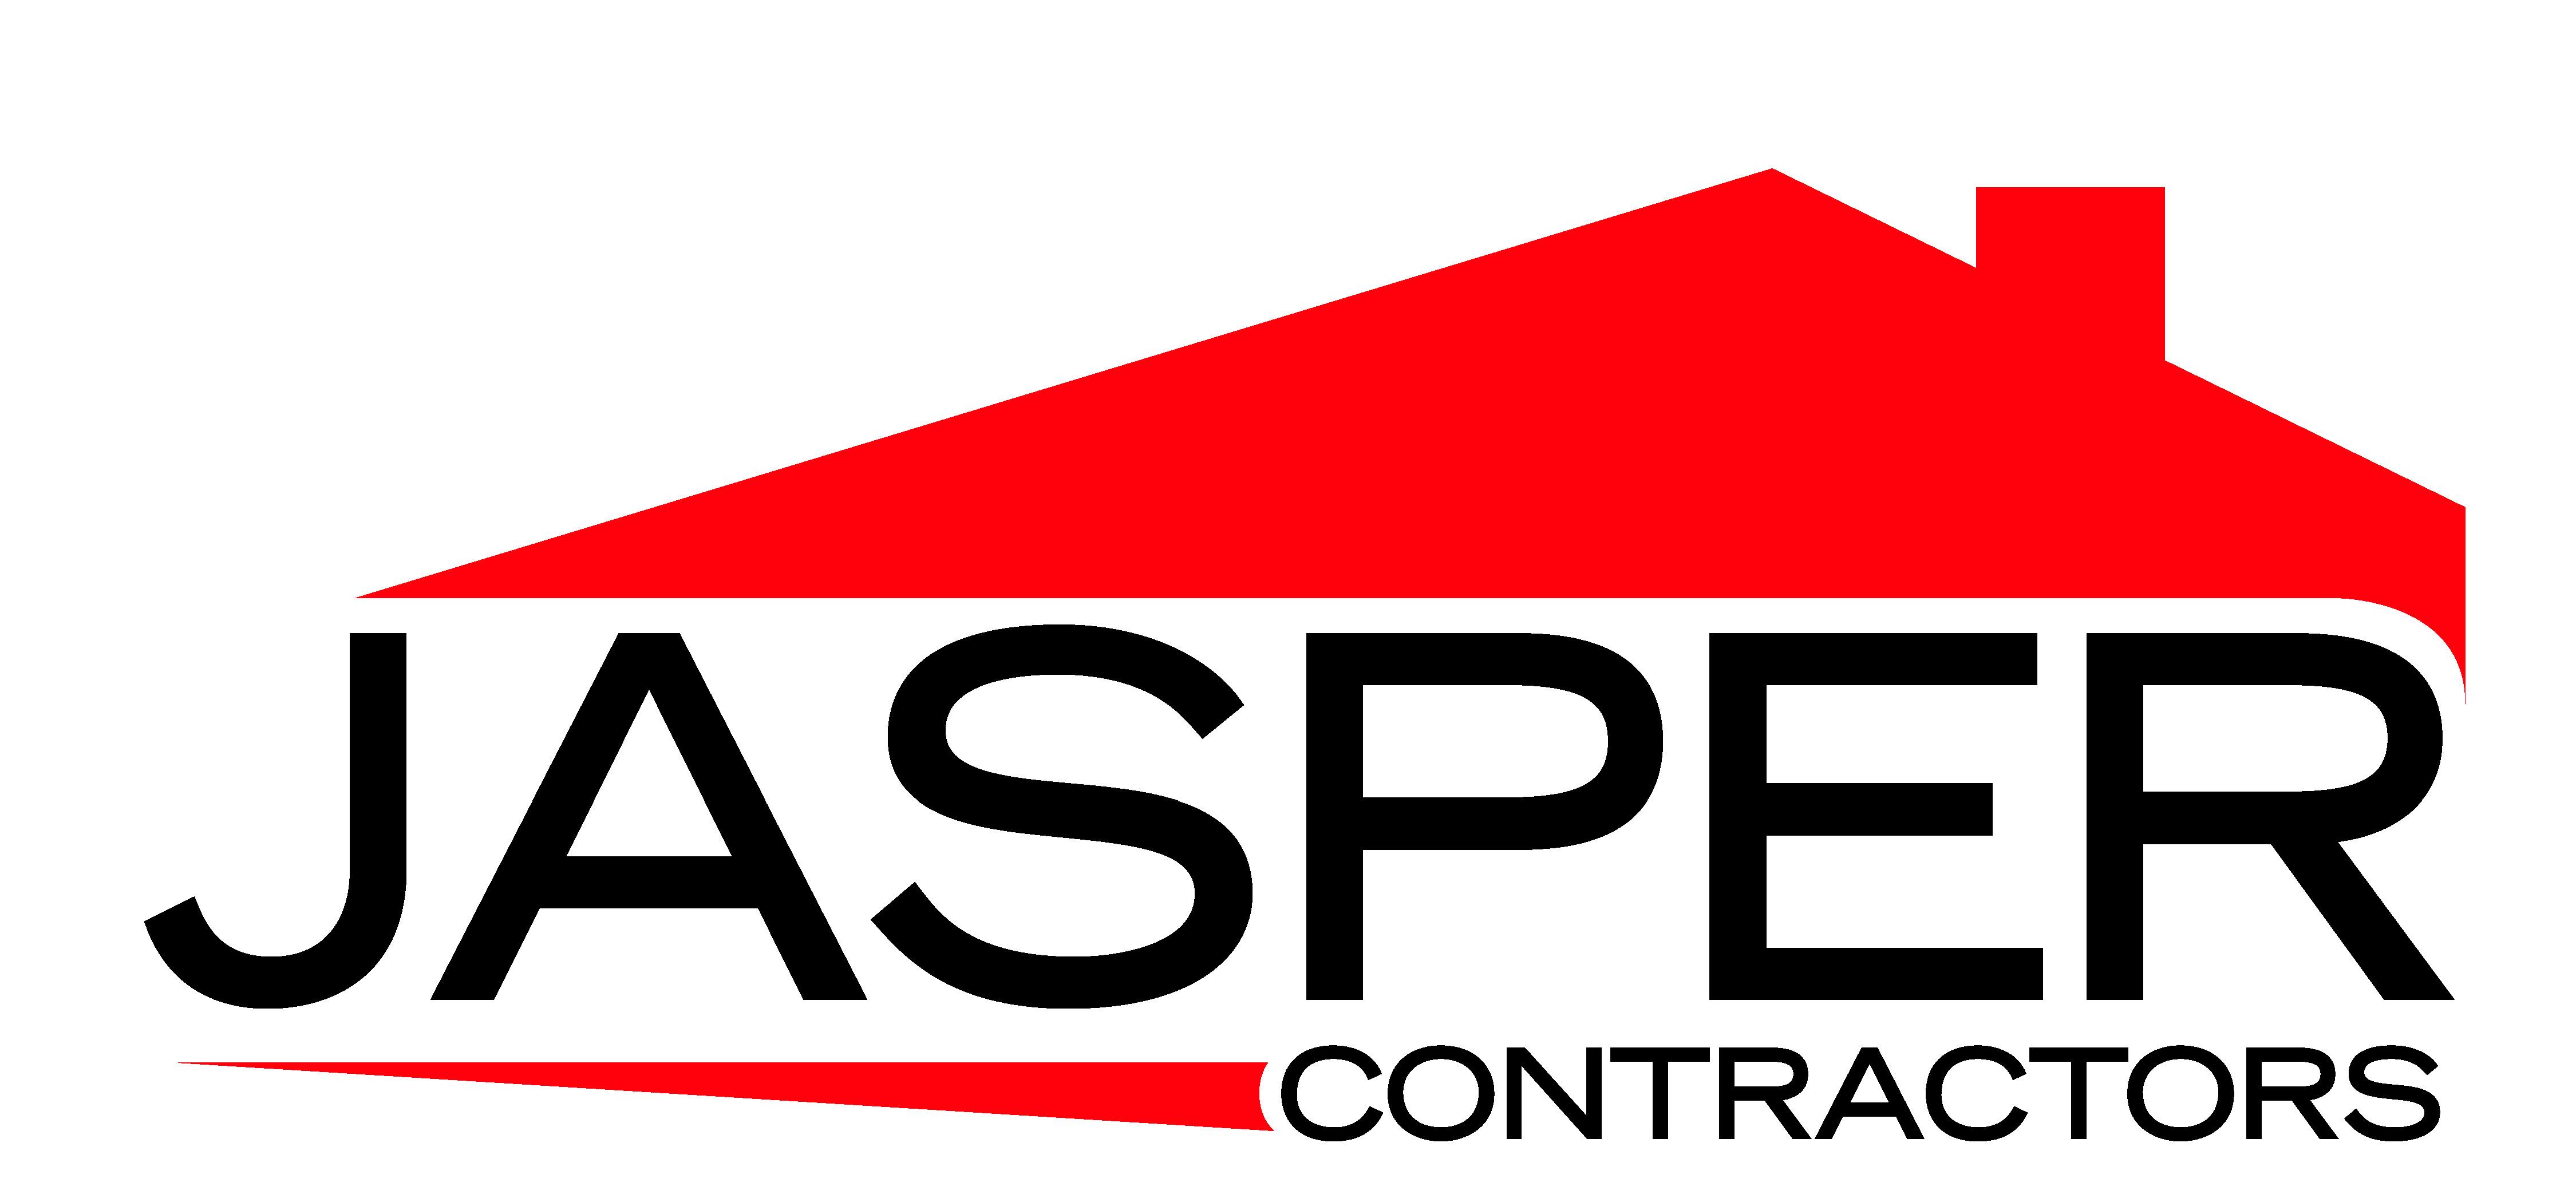 Jasper Contractors Inc Holding Orlando Career Event In